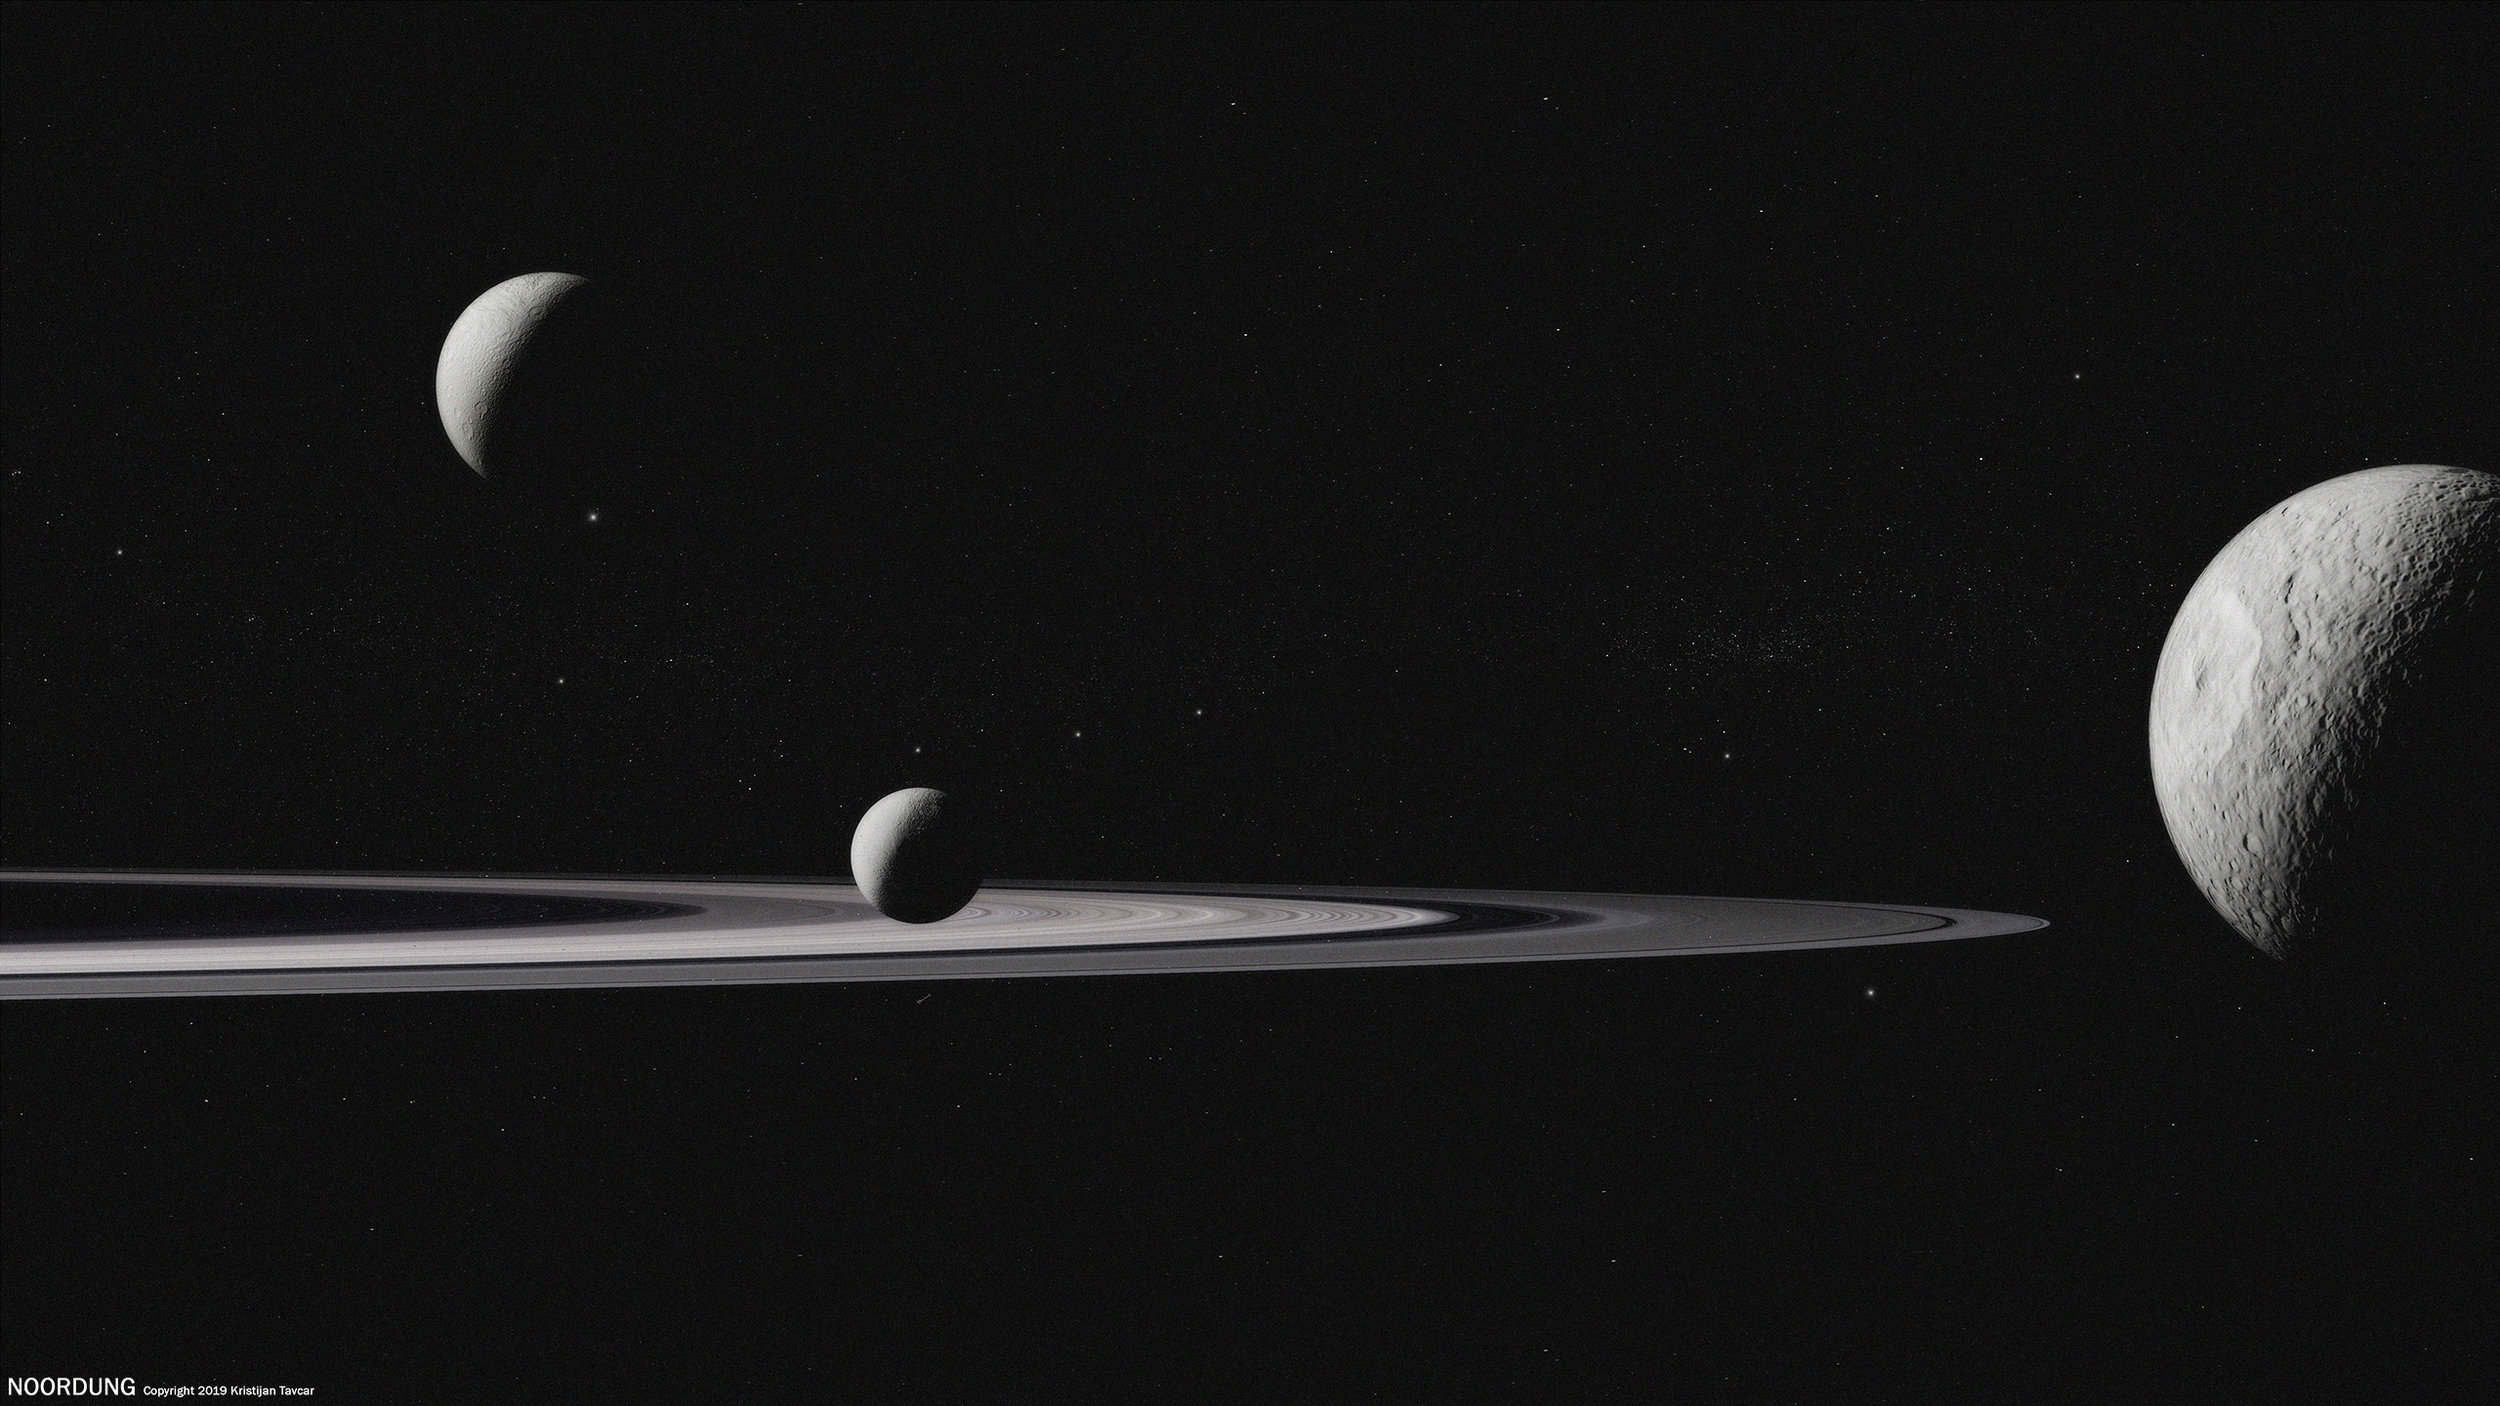 Noordung_Saturn_001_by Kristijan Tavcar.jpg